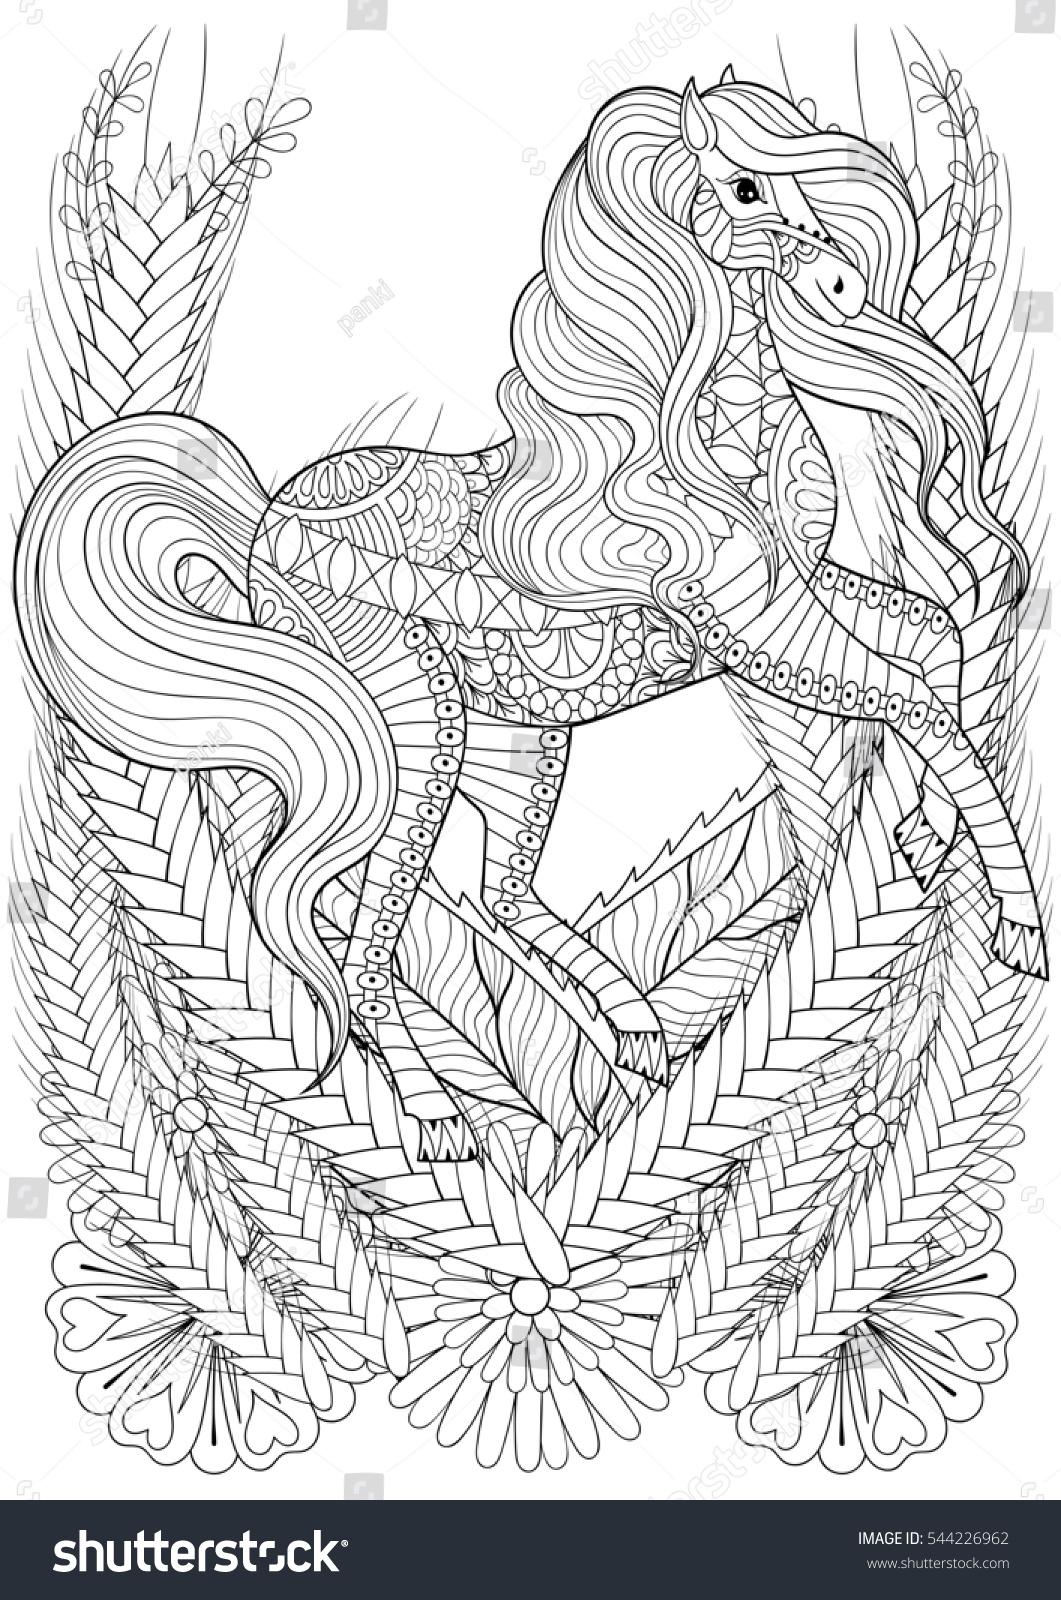 Racing Horse Flowers Adult Anti Stress Stock Illustration 544226962